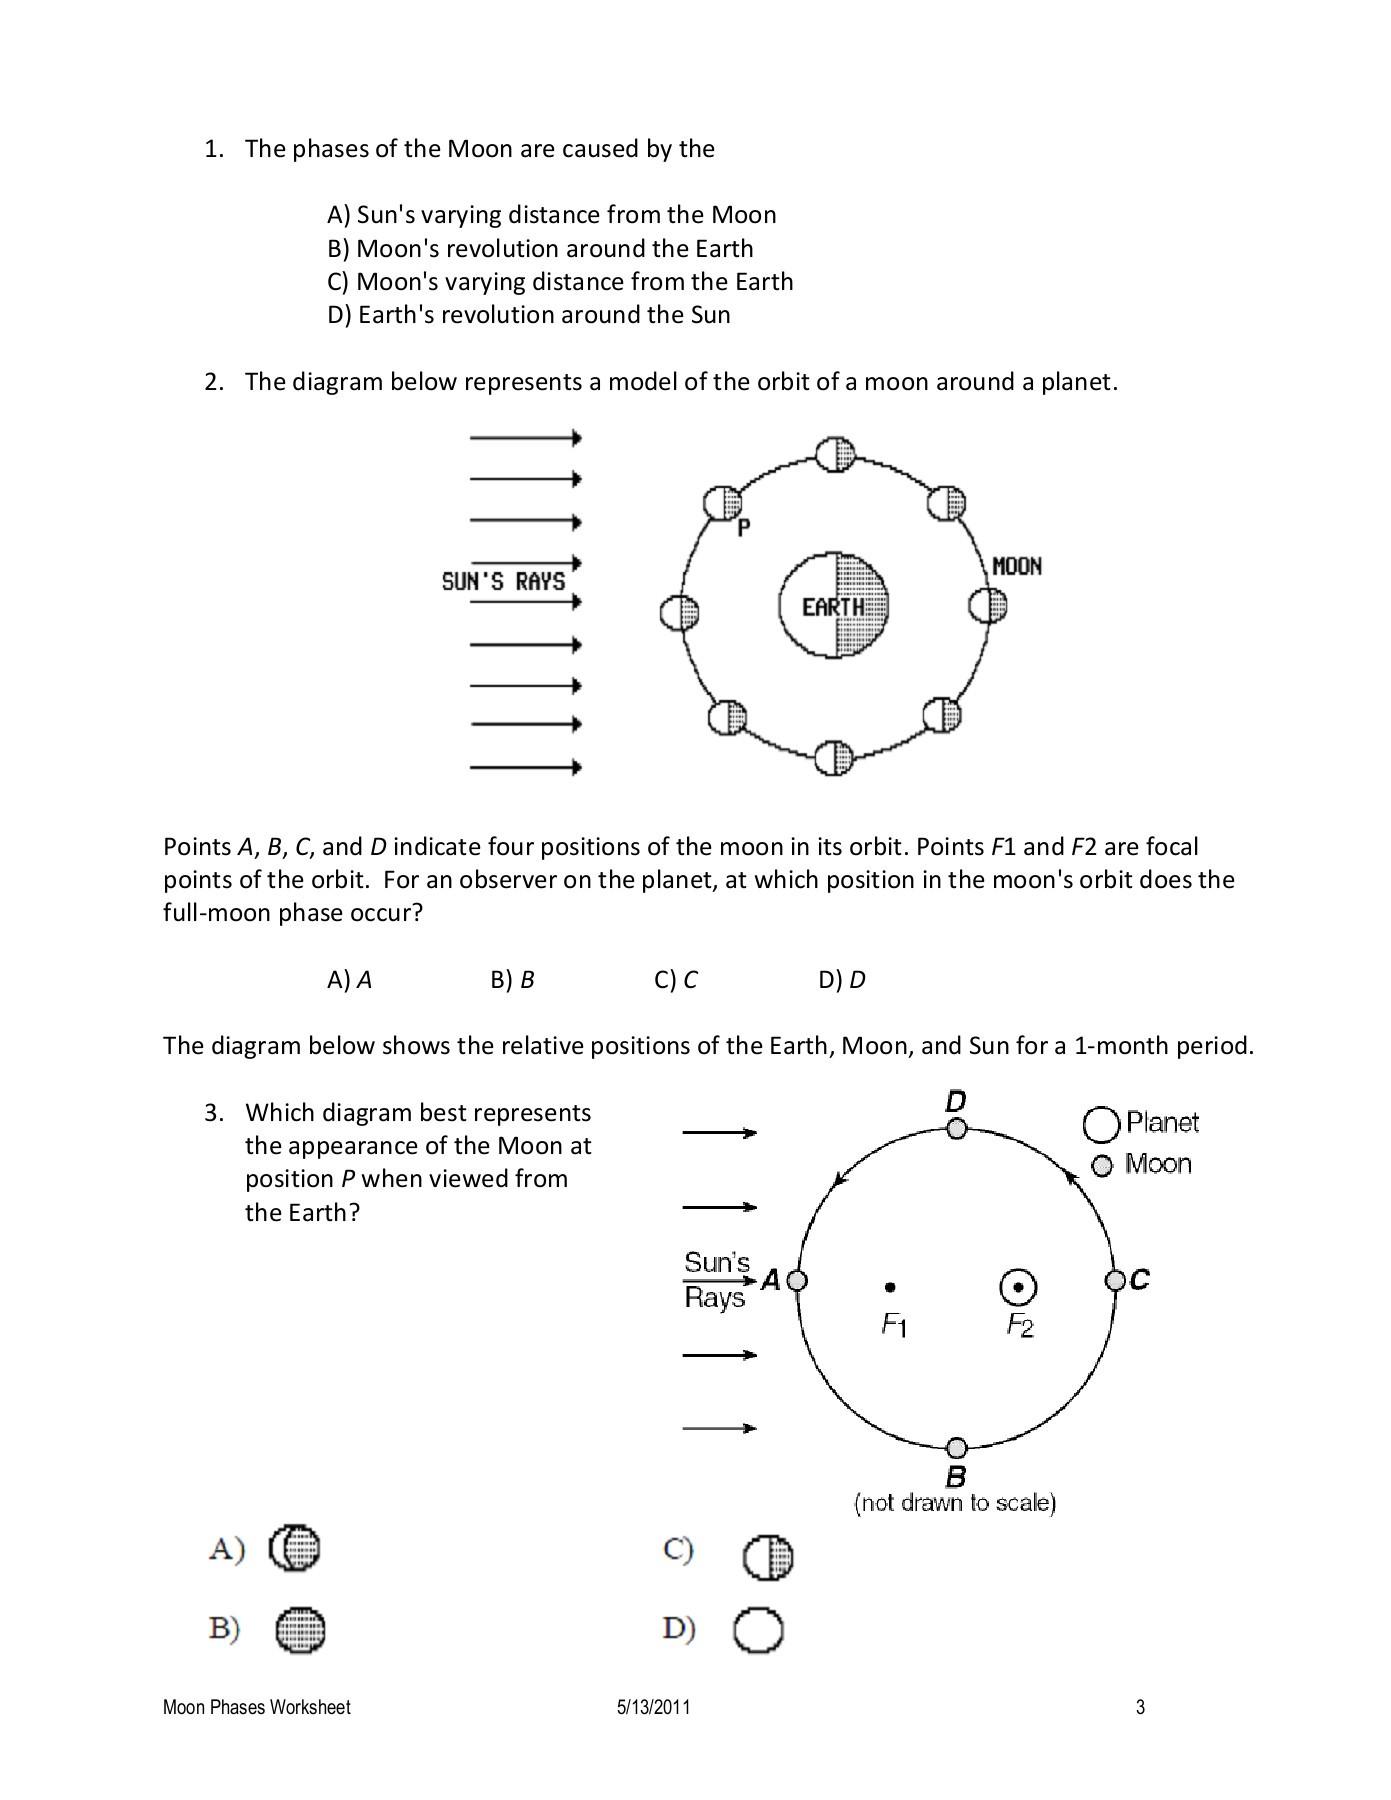 Moon Phases Worksheet Pdf Moon Phases Worksheet